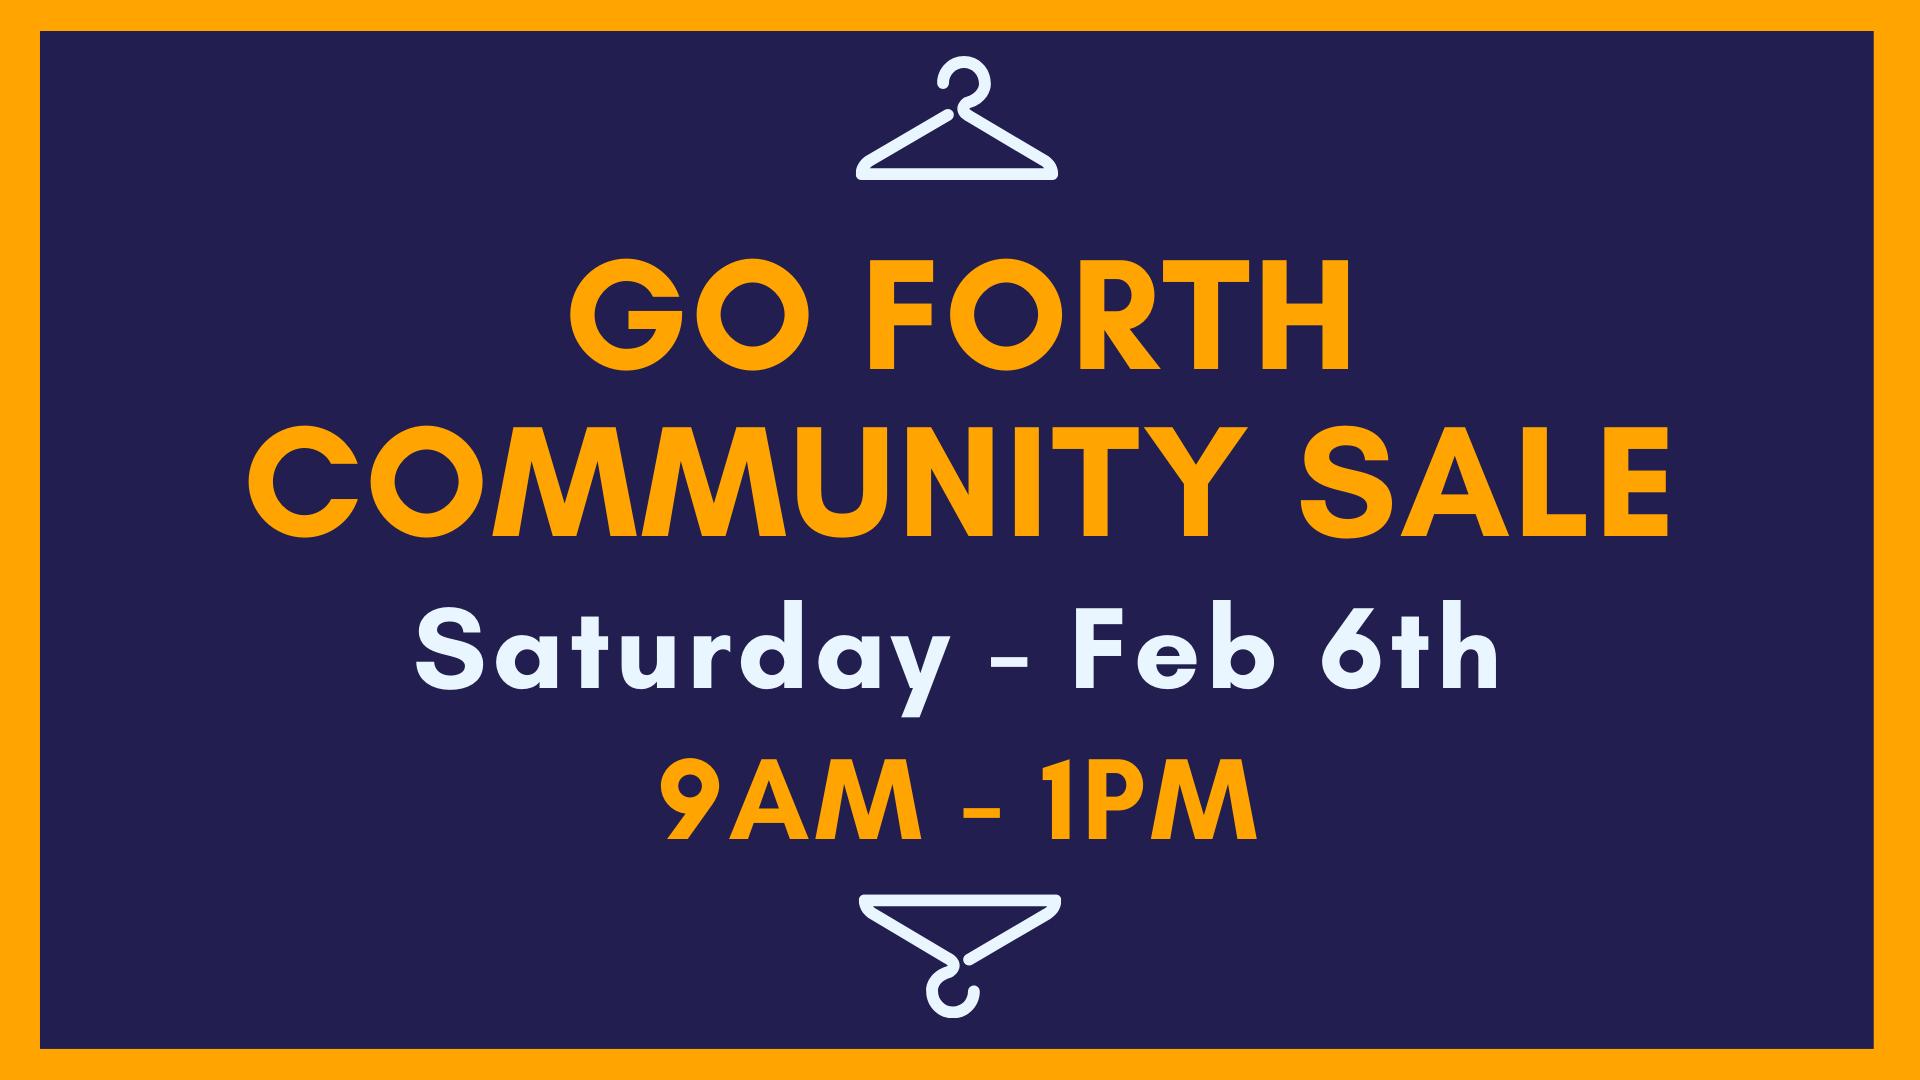 GoForth Community Sale 2.6.21